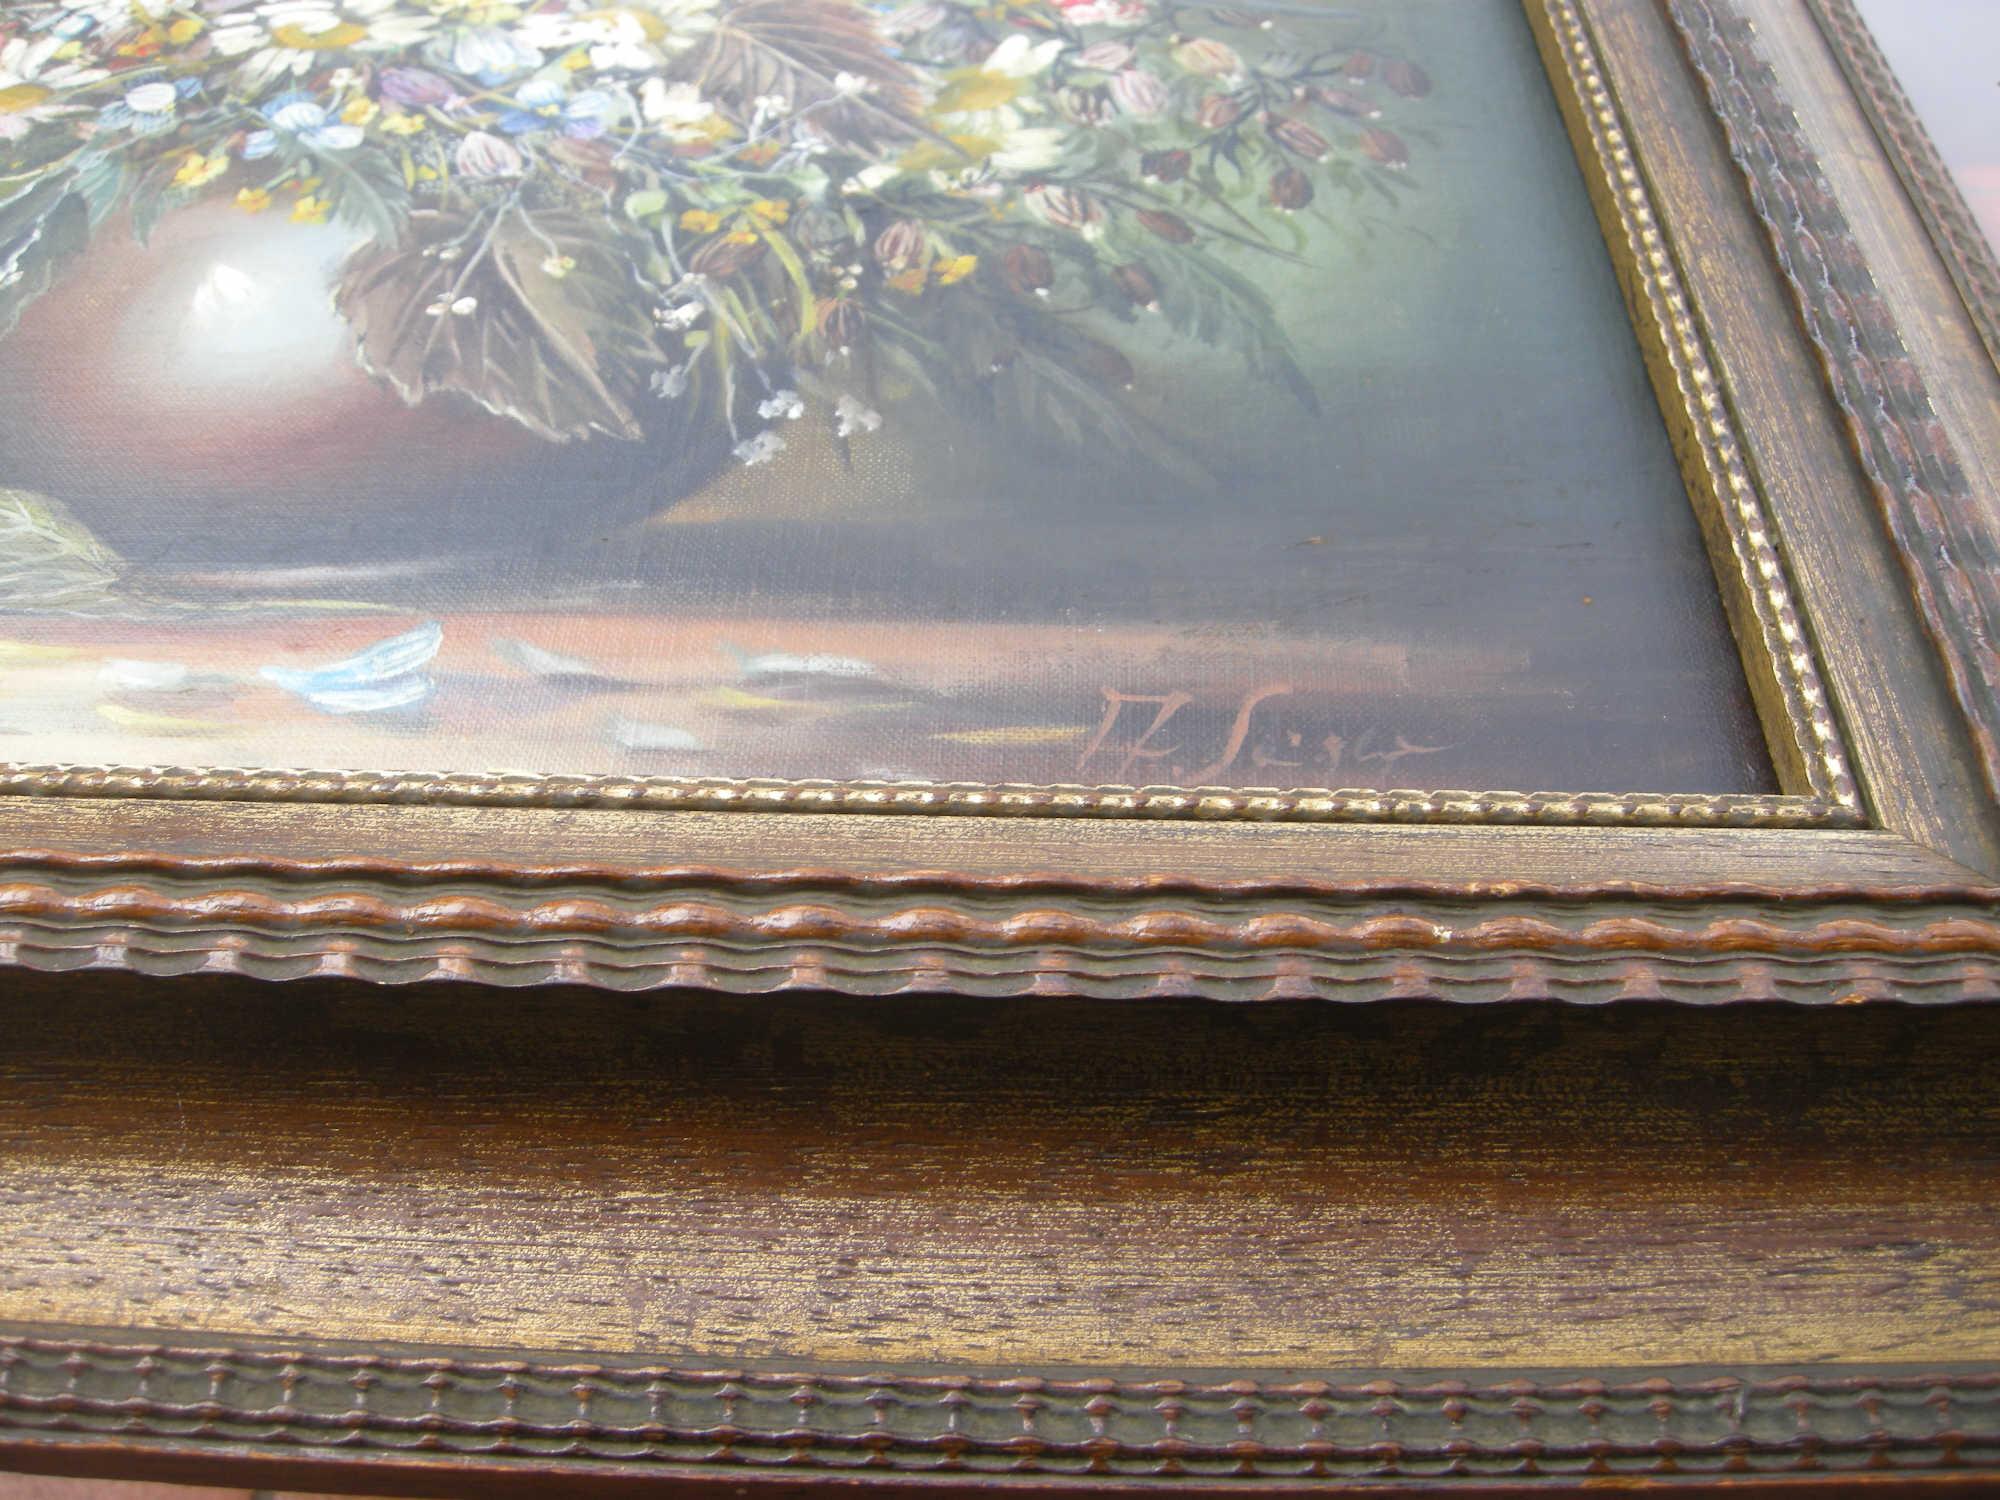 Kunst Malerei Wildblumen in Vase - A.Seger - Bilder Rünagel ...